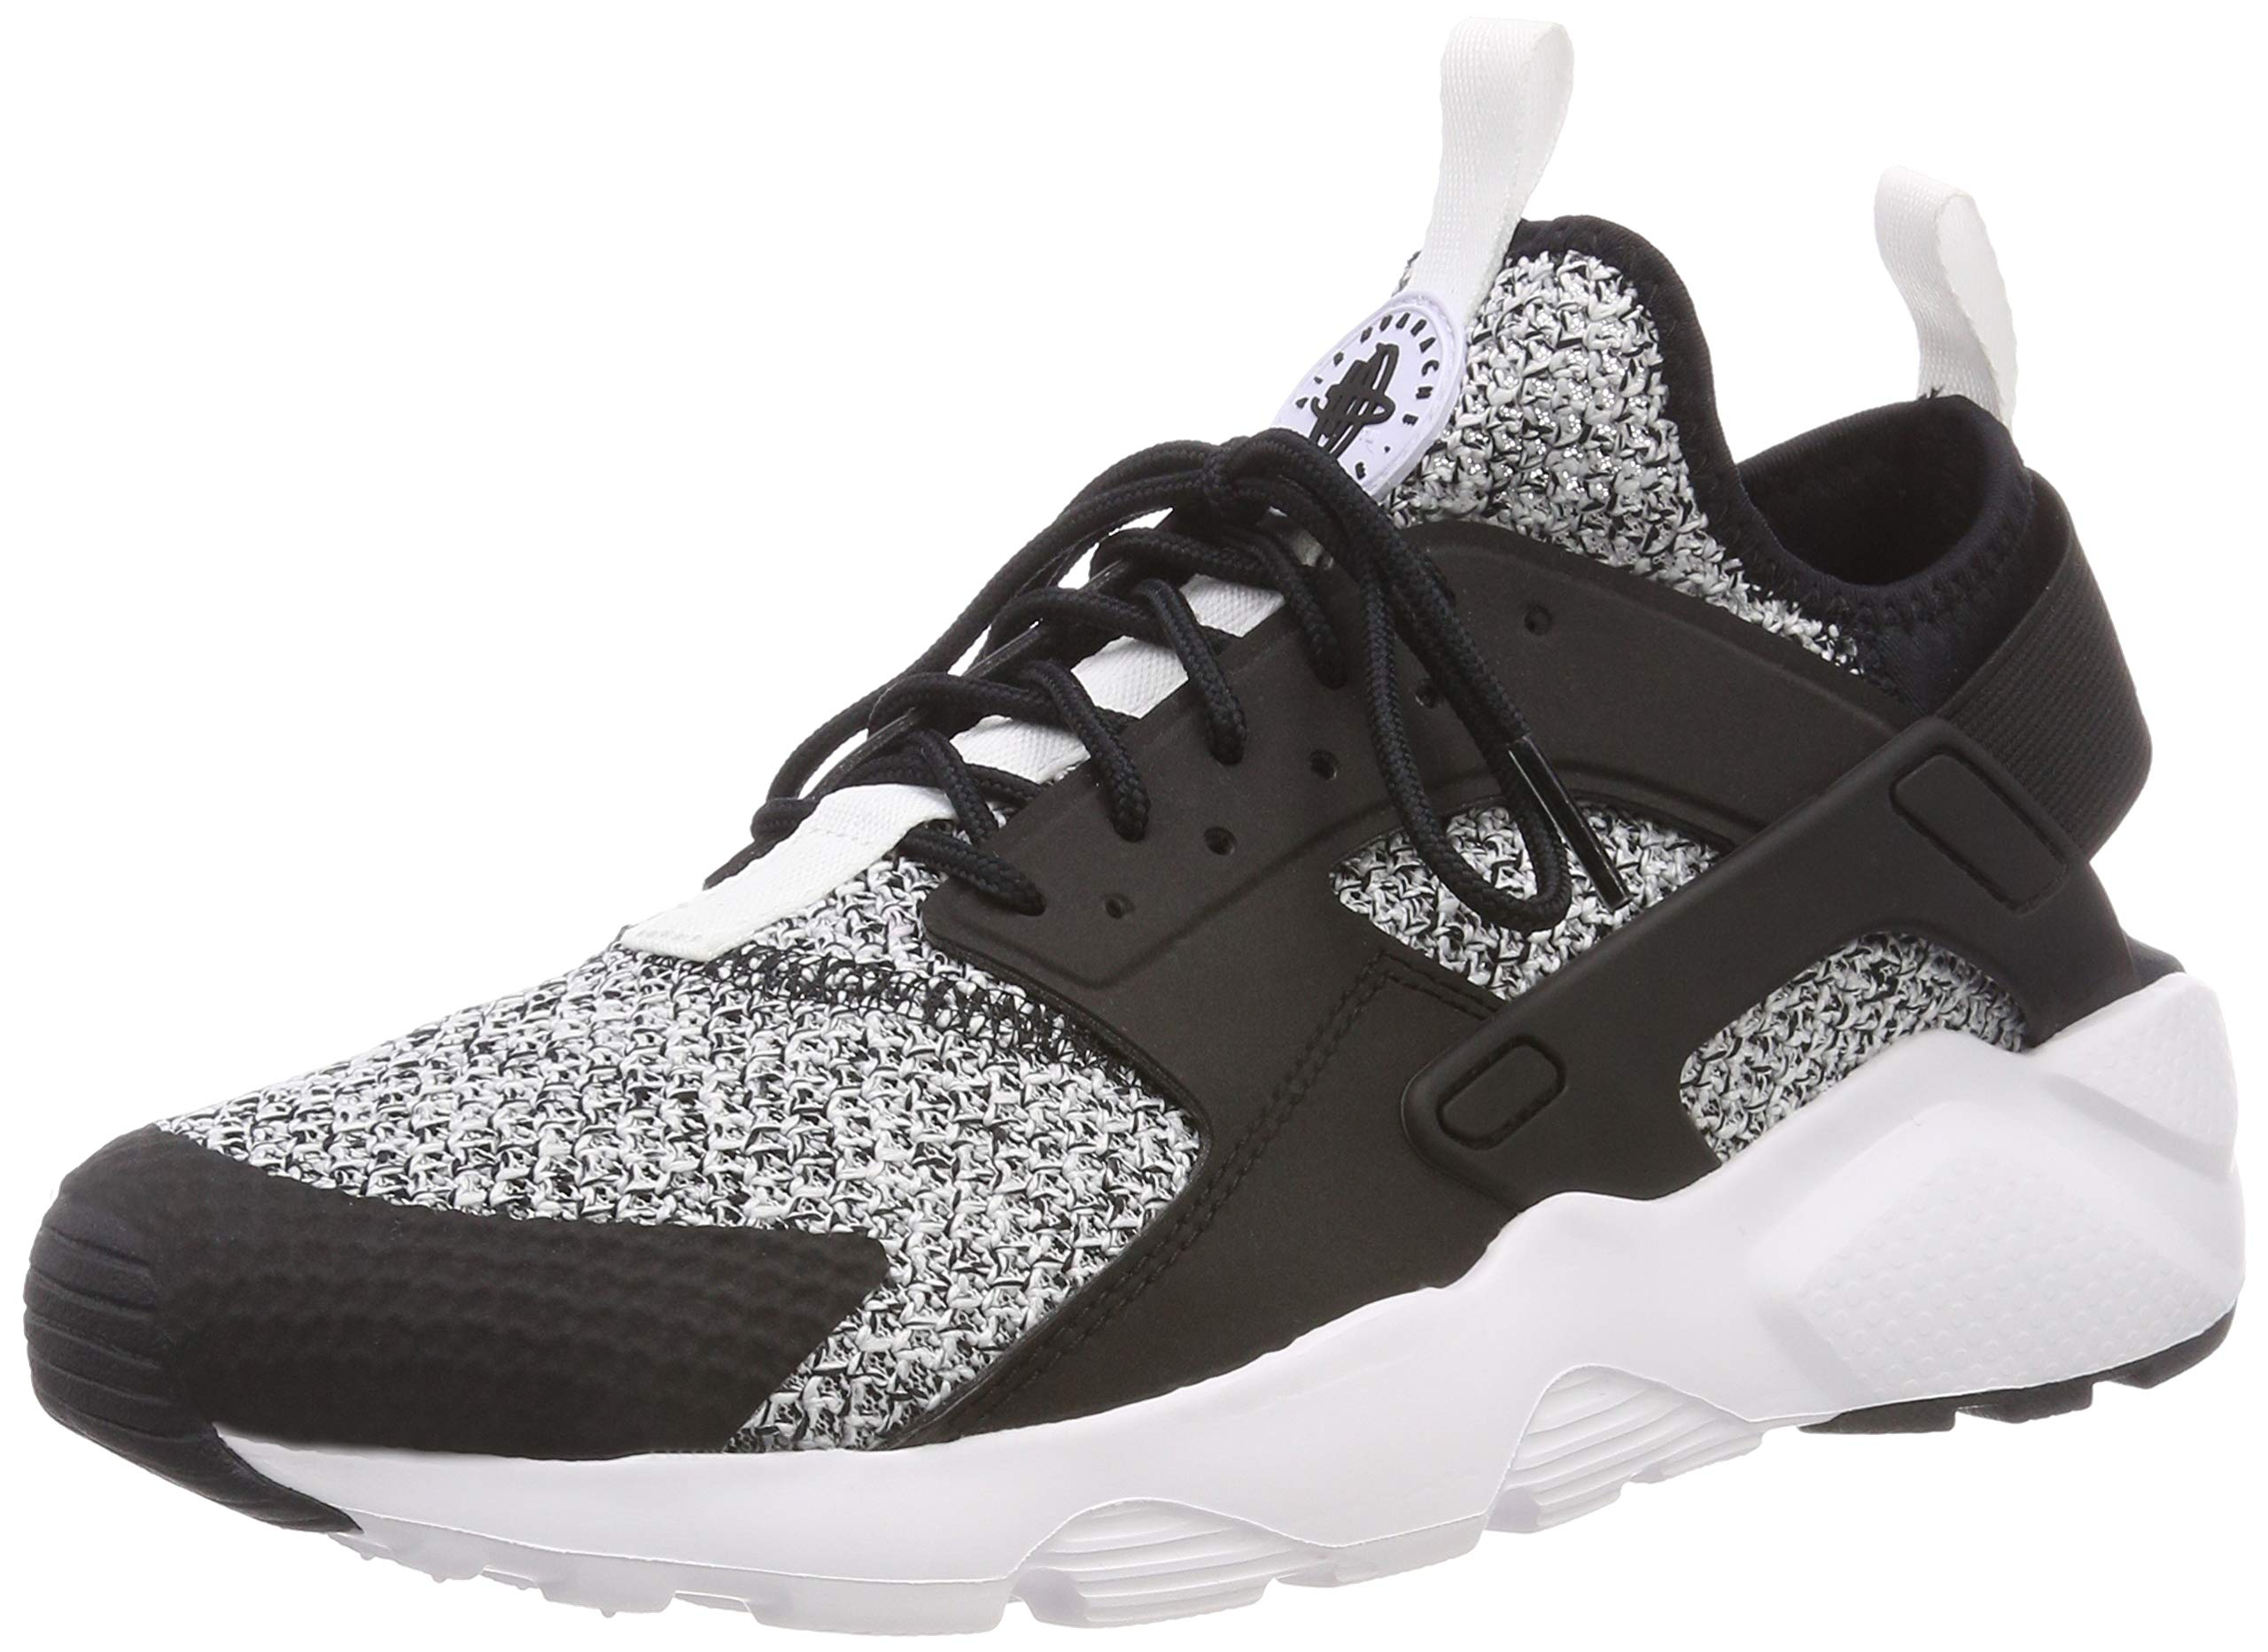 9abb1c248add Galleon - NIKE Mens Huarache Ultra SE Running Shoes Black White White 875841-010  Size 8.5